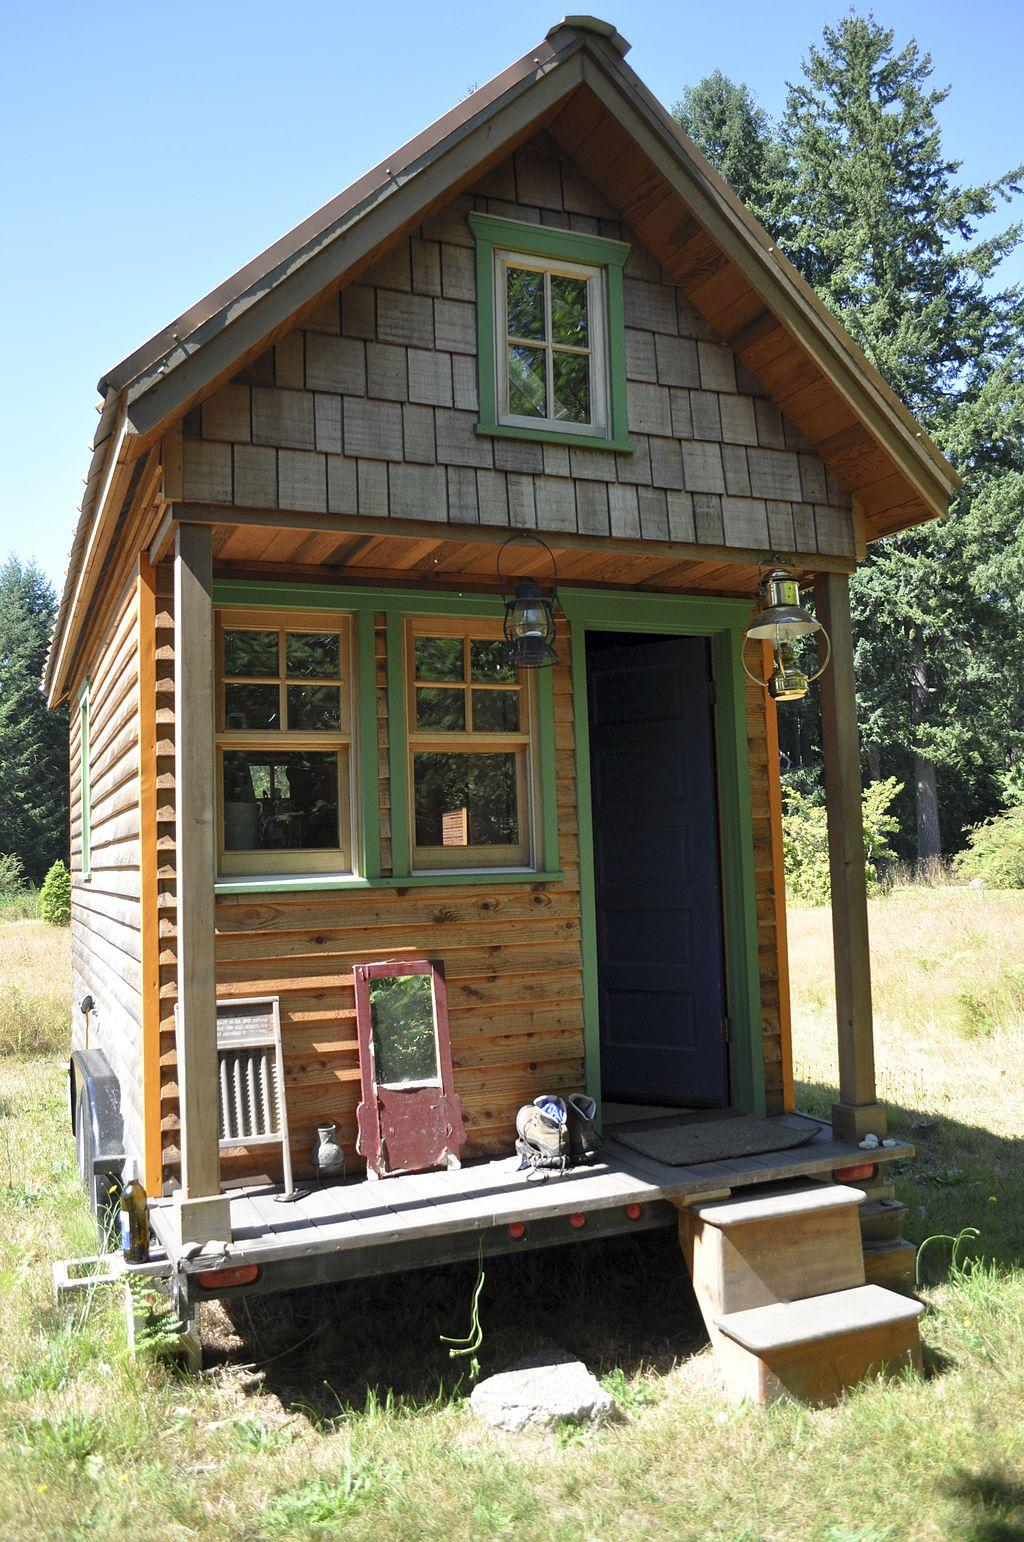 Exploring the tiny house lifestyle wgcu news for Minihaus bausatz